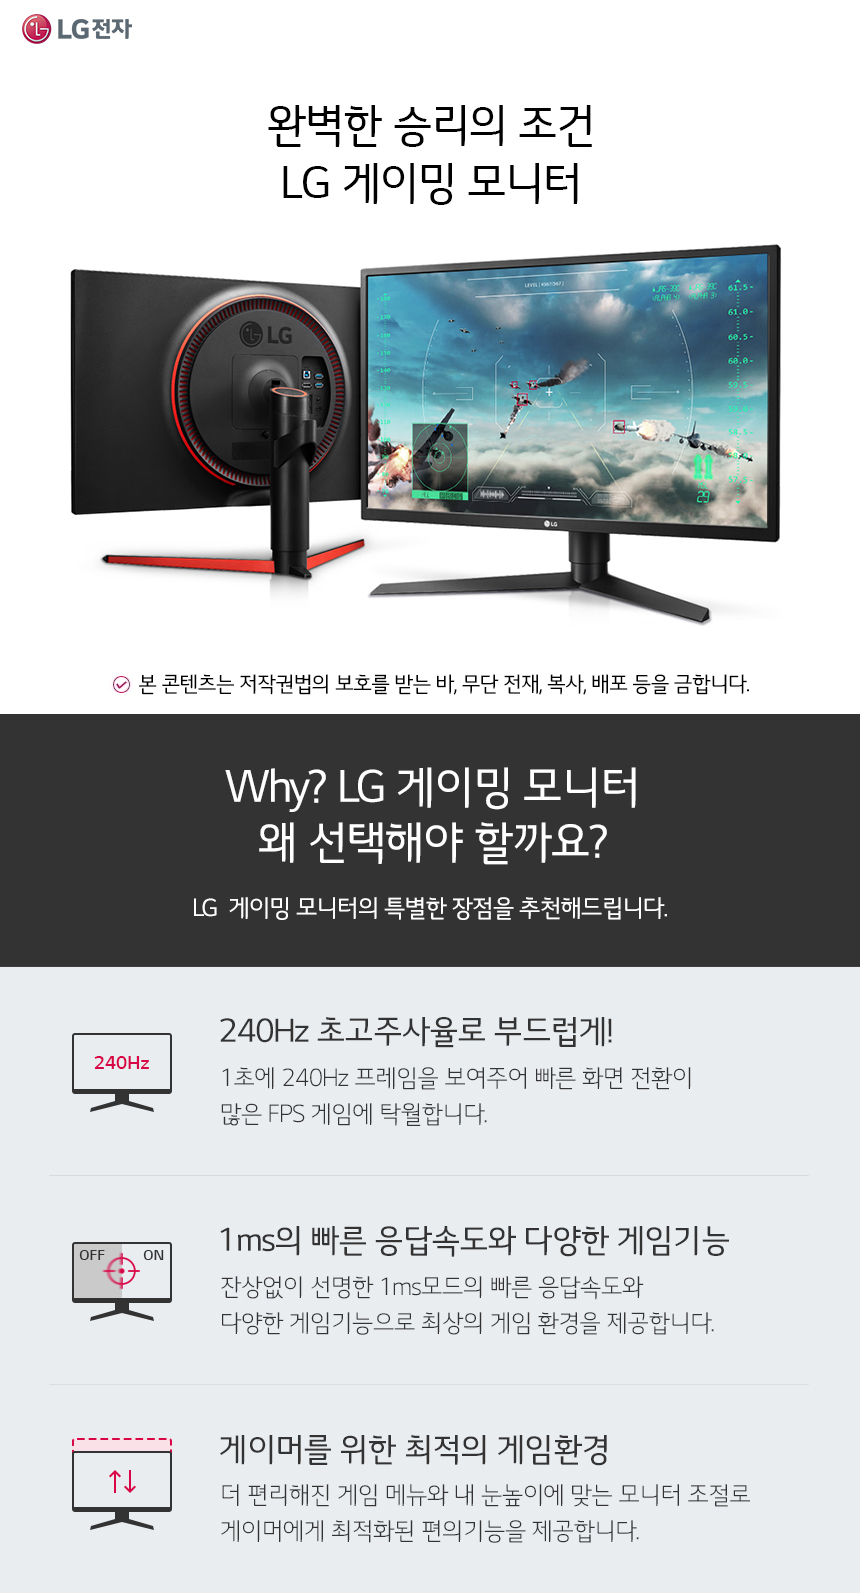 GK750F_why.jpg